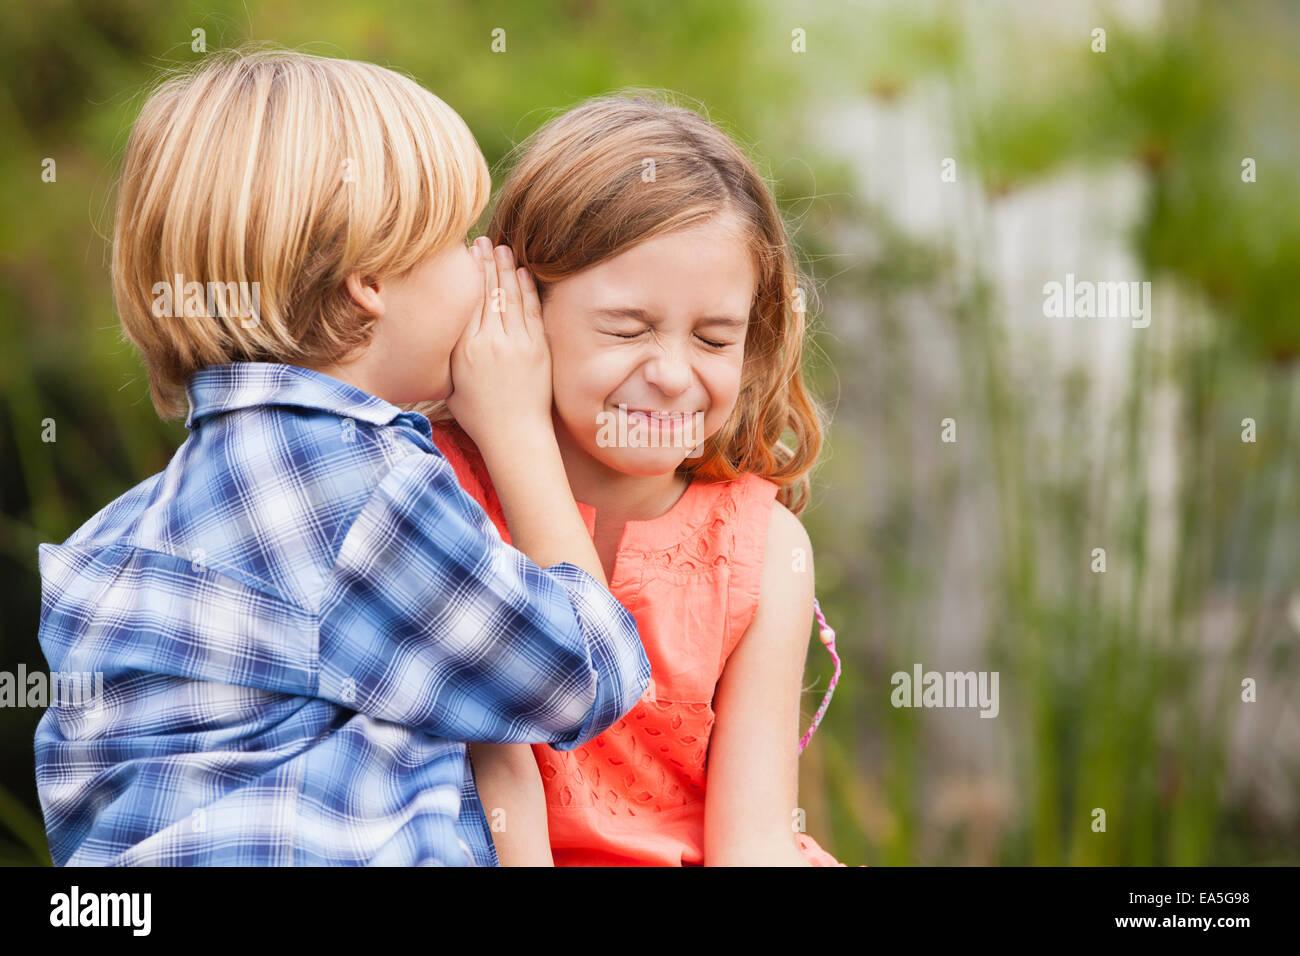 Boy whispering into girl's ear - Stock Image